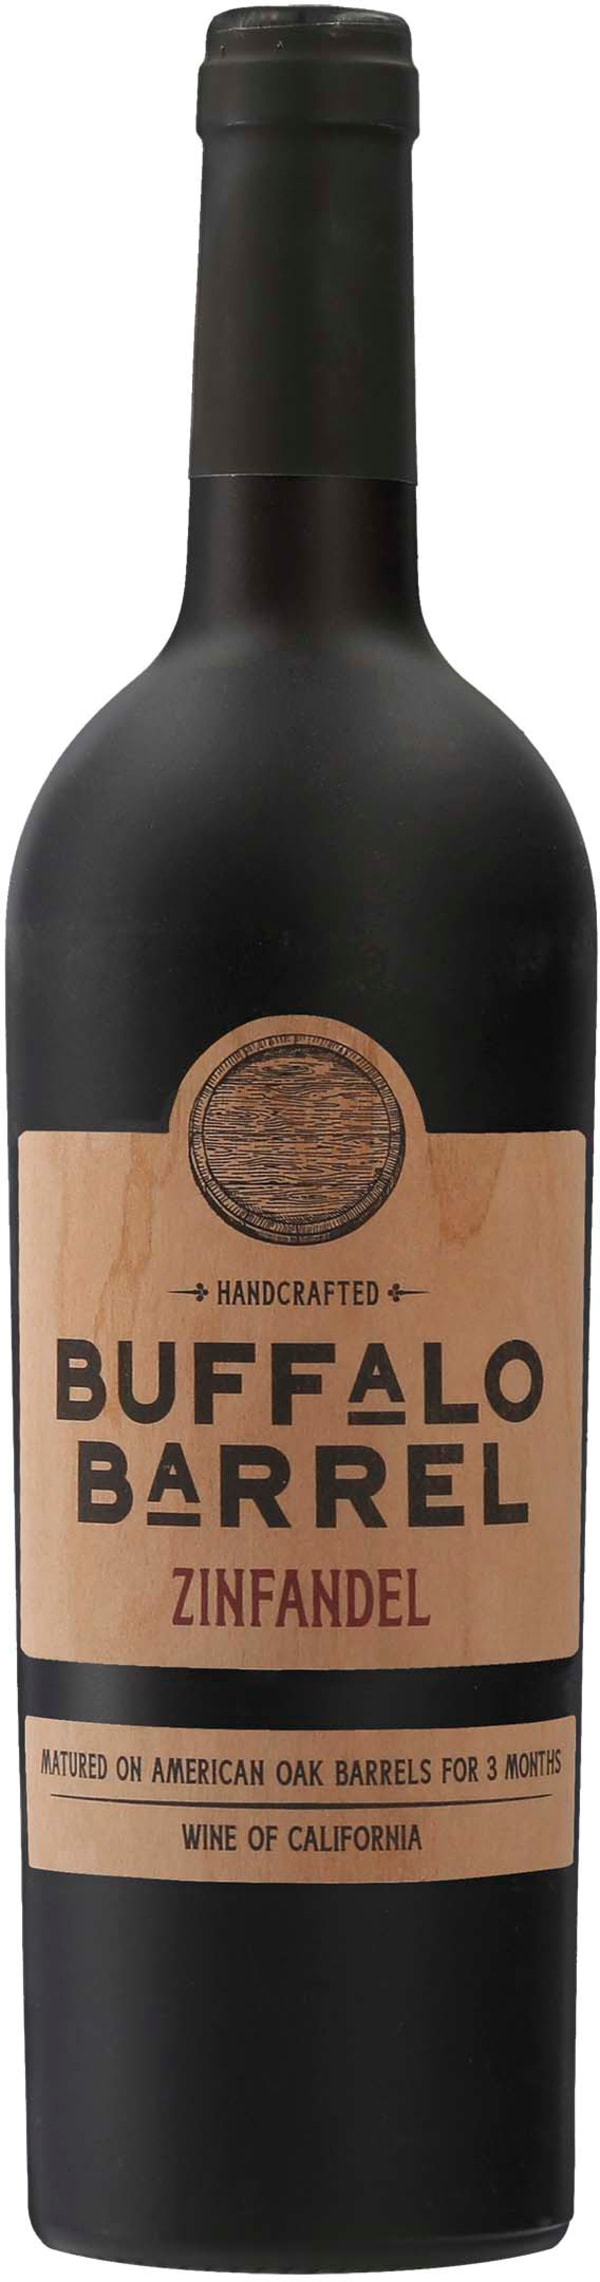 Buffalo Barrel Bourbon Barrel Aged Zinfandel 2018